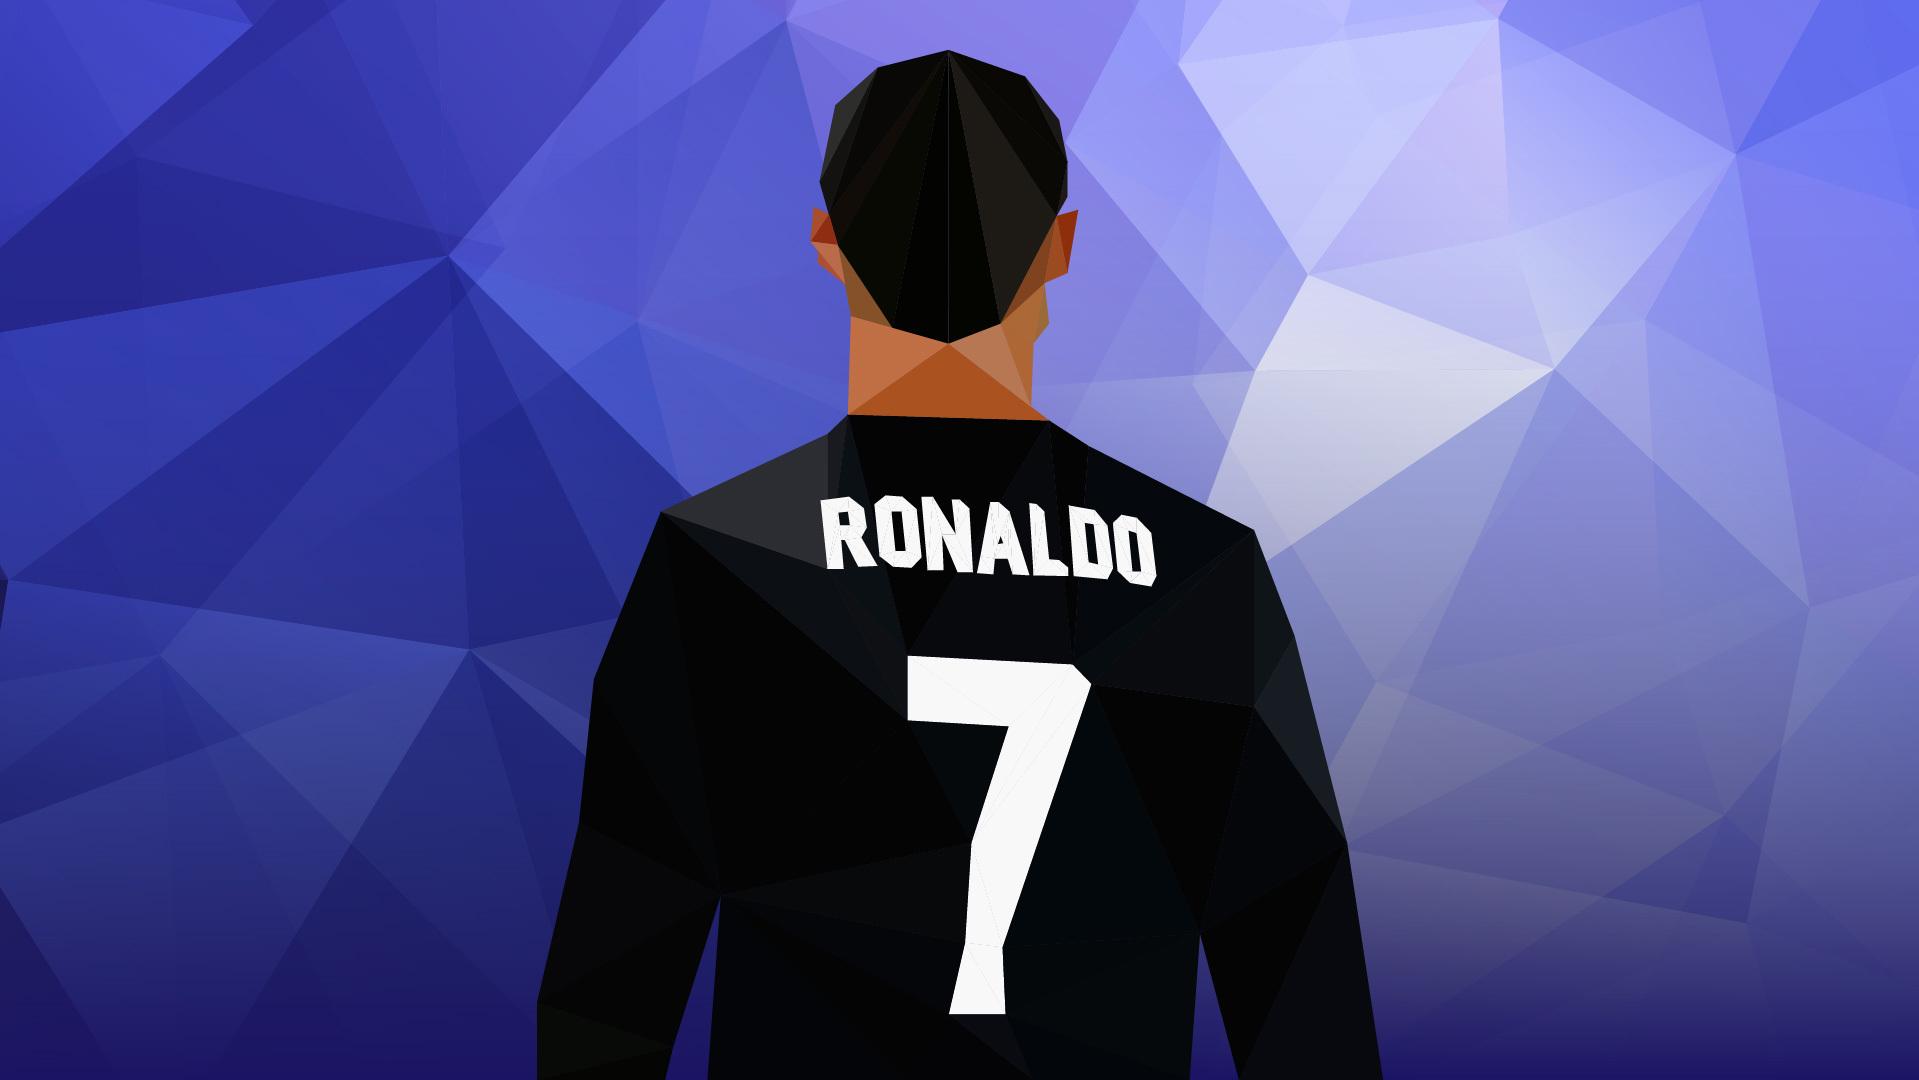 docu-reality Cristiano Ronaldo Facebook